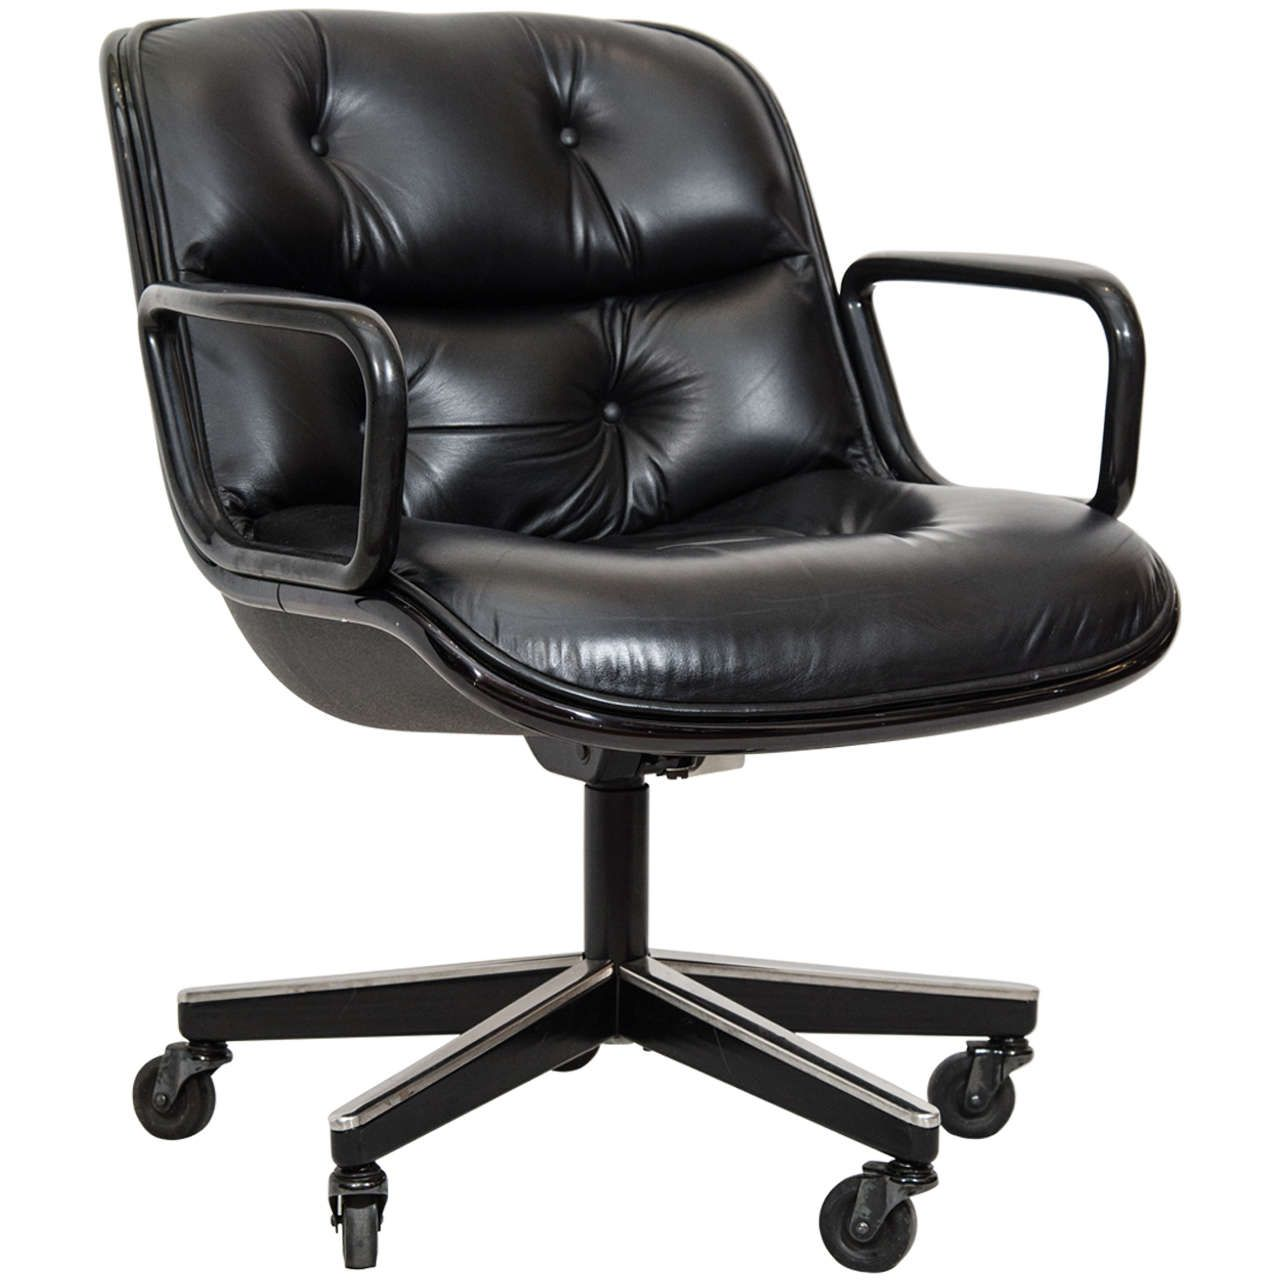 Genial Charles Pollock Executive Desk Chair For Knoll | 1stdibs.com